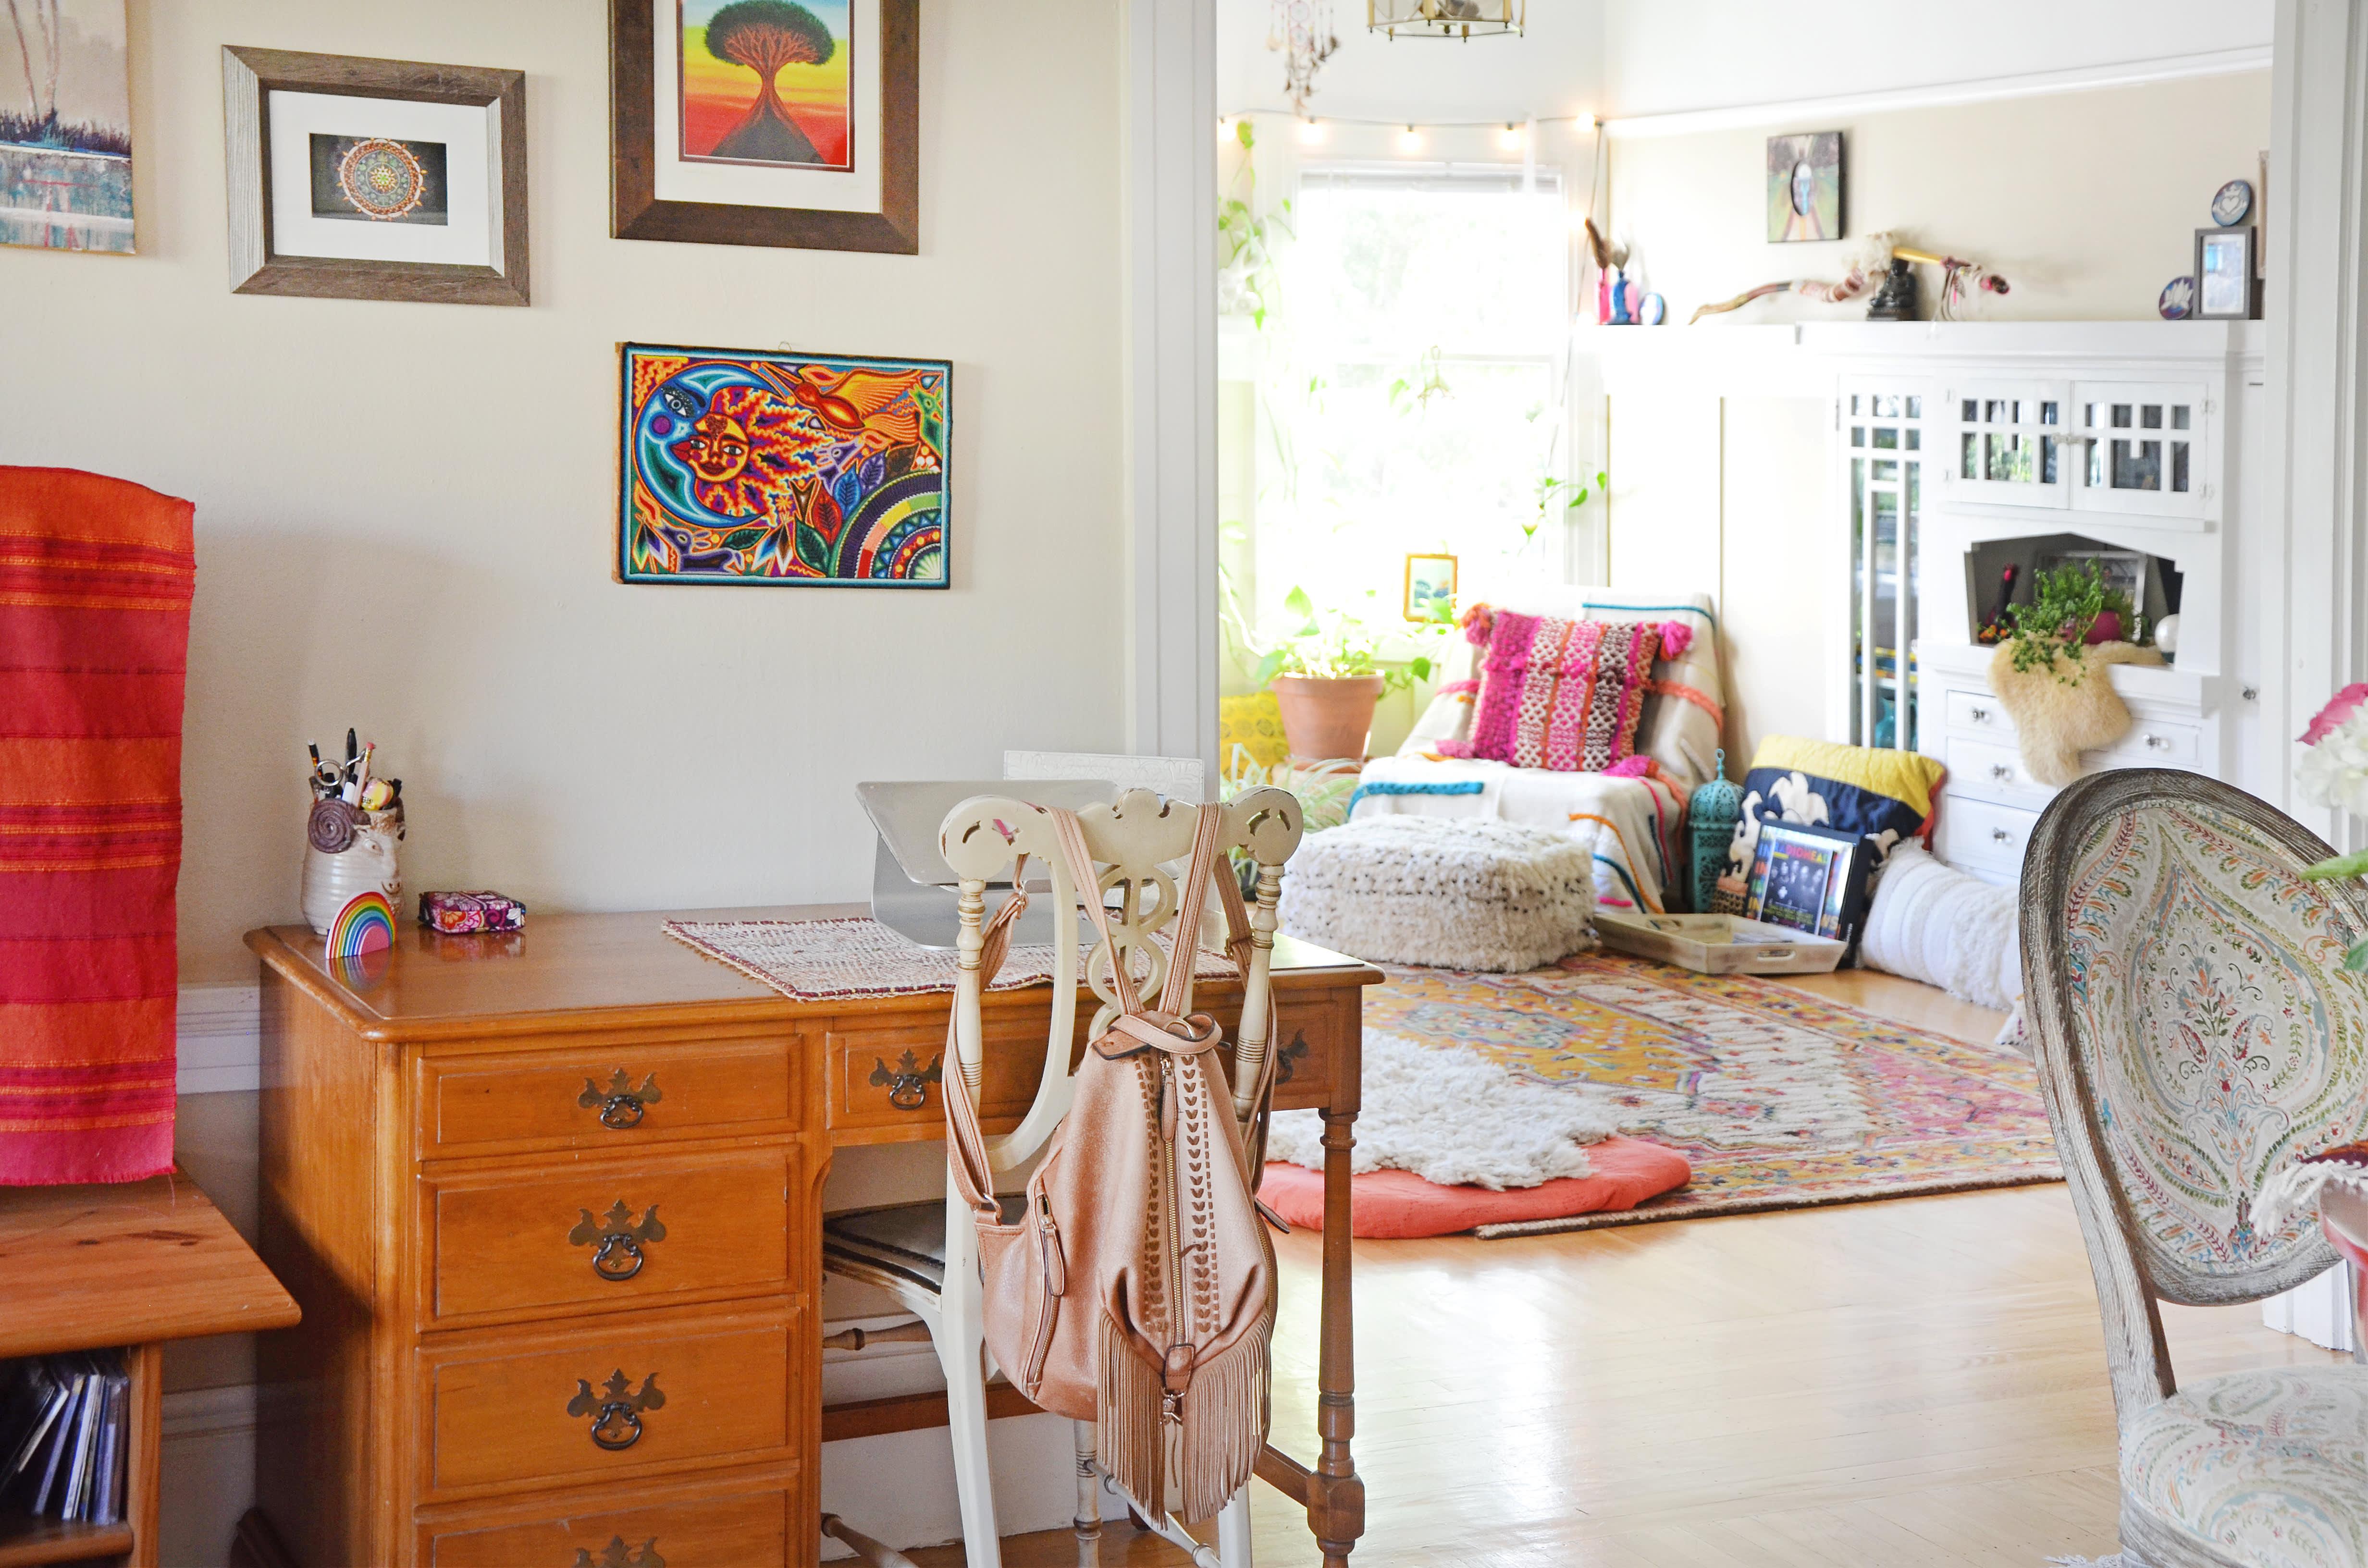 House Tour: A Rainbow-Boho Apartment in Oakland ...